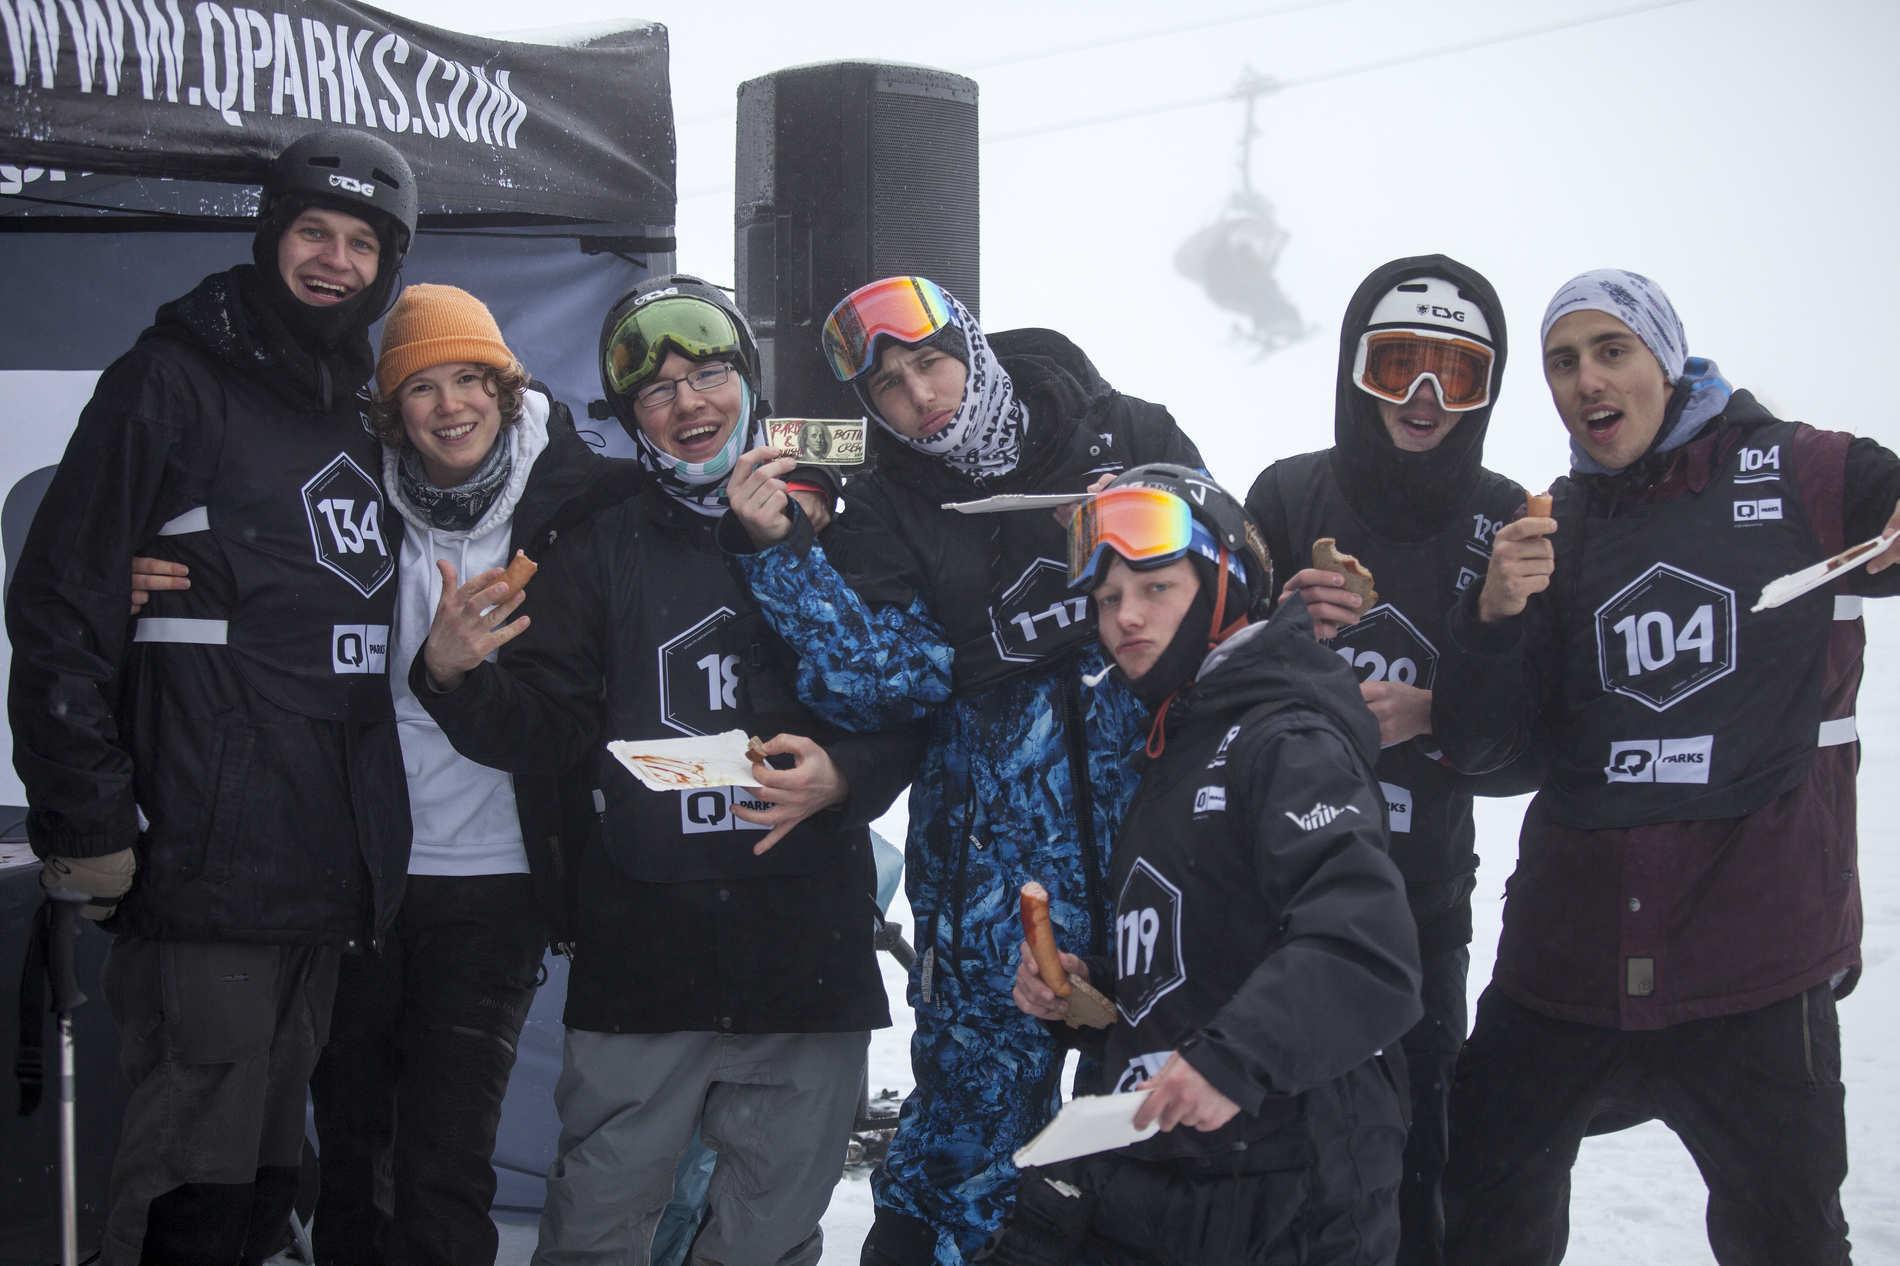 web snowpark feldberg 17 02 2018 lifestyle fs sb martin herrmann qparks 72